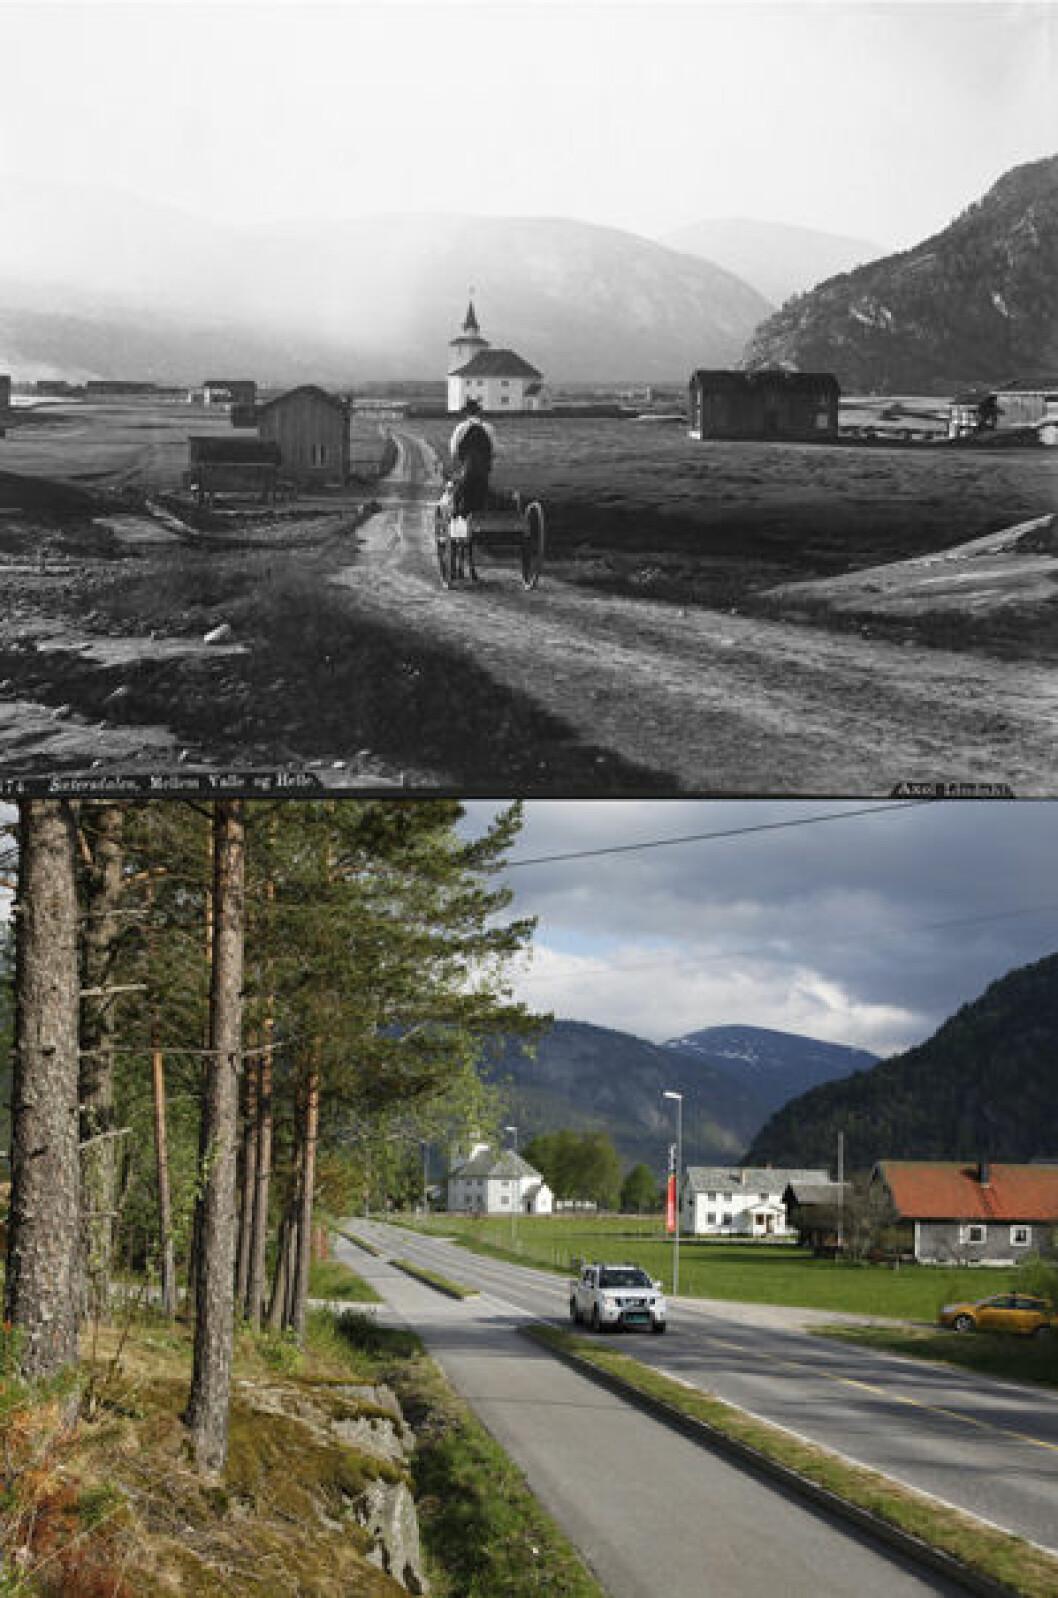 1888 og 2013: Fra Rysstad i Setesdal, Valle i Aust-Agder. Foto: Axel Lindahl/Oscar Puschmann